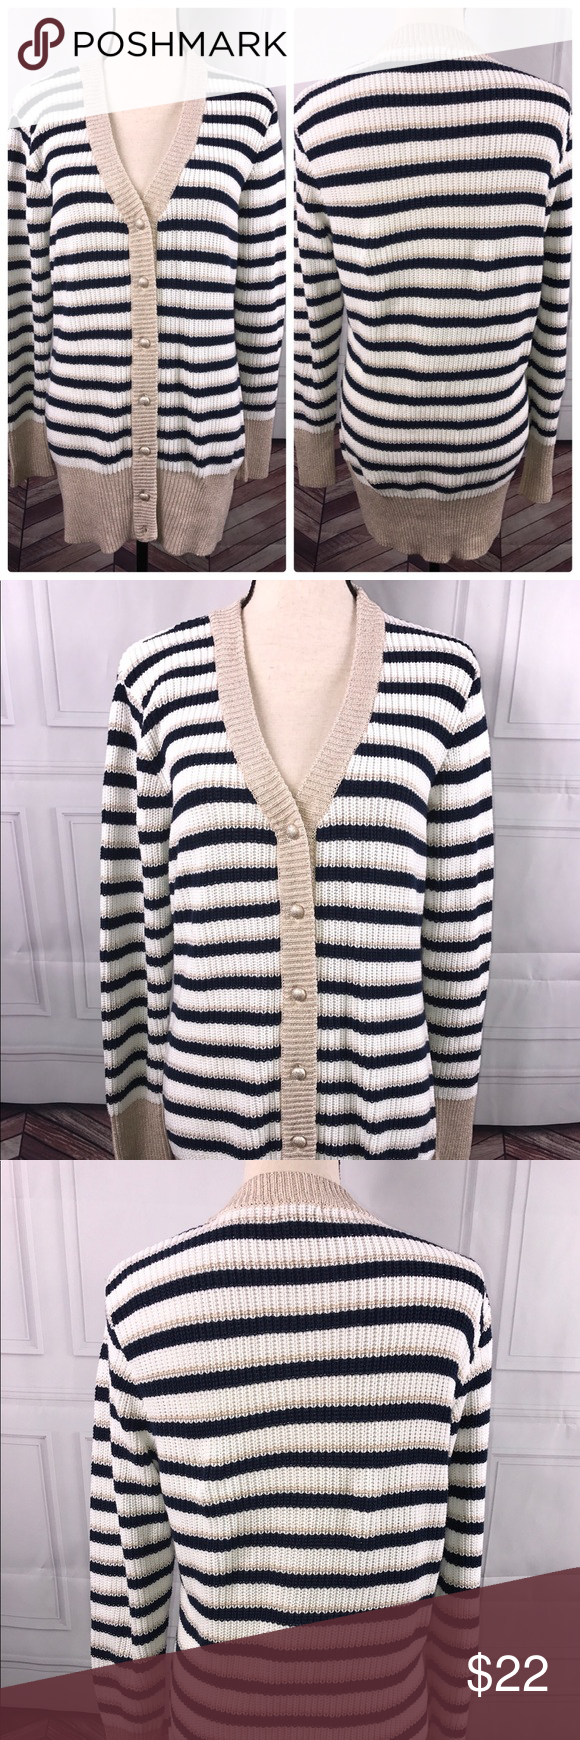 Boston Proper Medium Striped Cardigan Sweater Boston Proper Medium ...